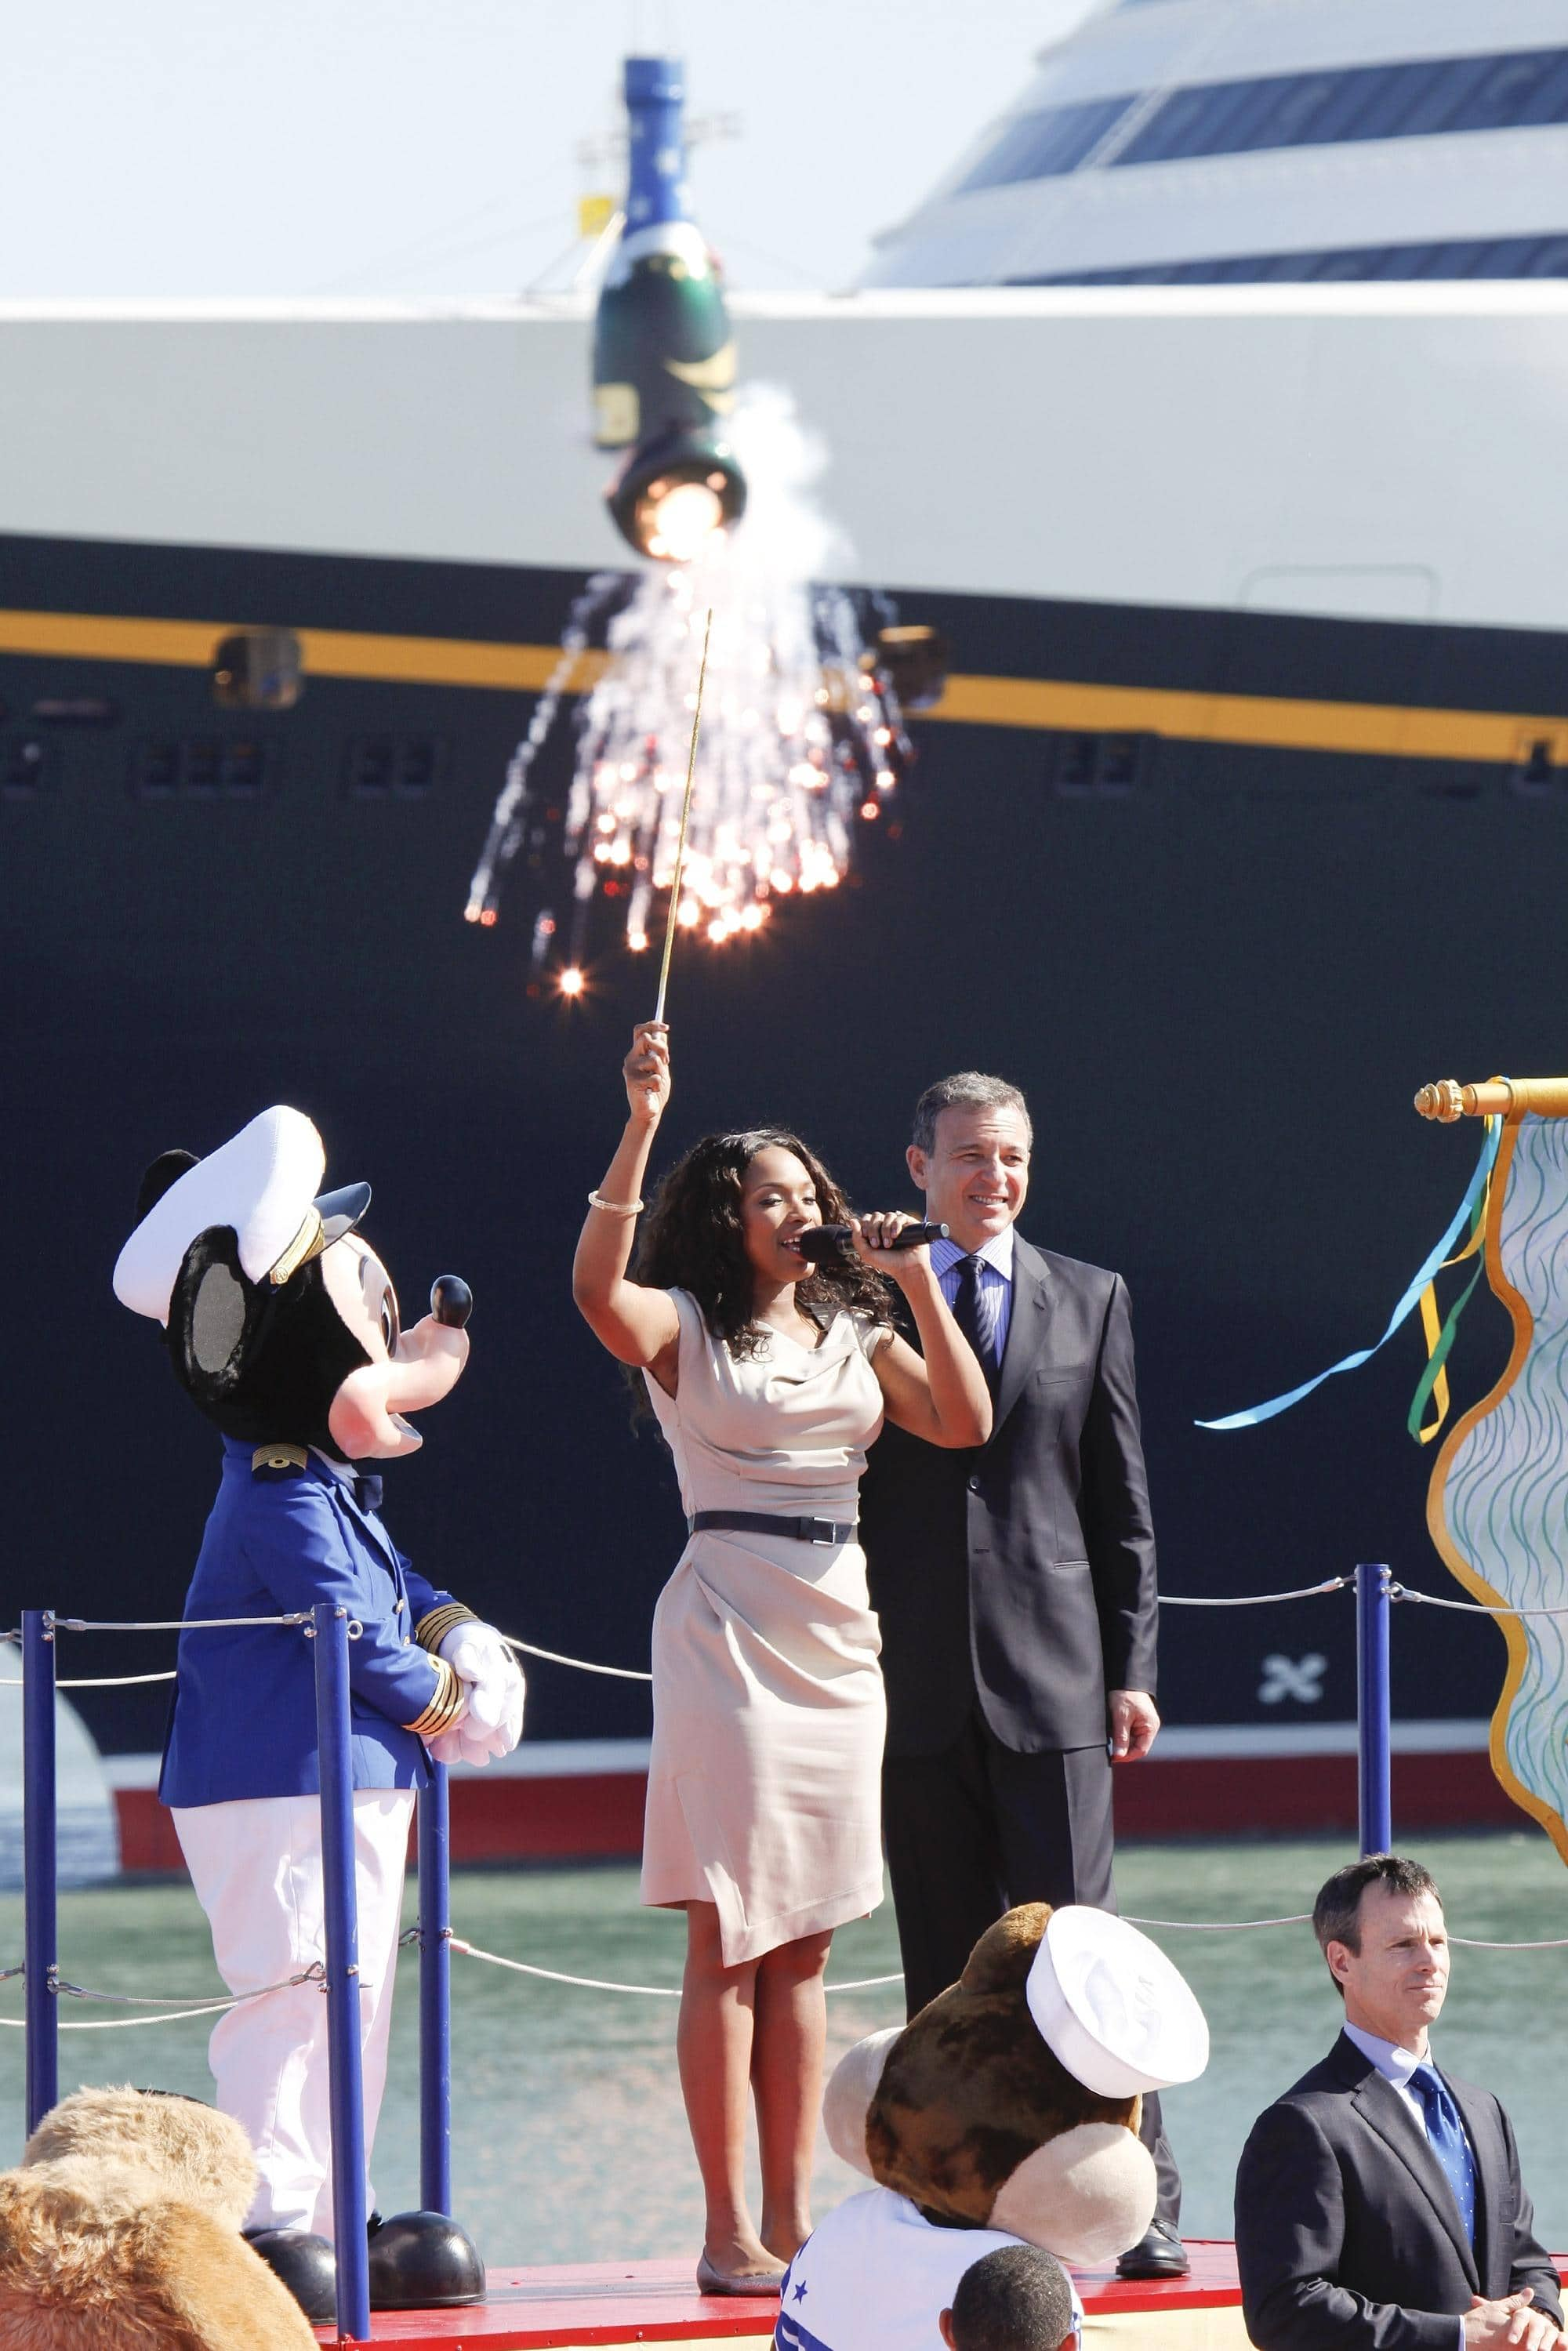 Mickey Mouse, Disney Dream Fairy Godmother Jennifer Hudson and Disney CEO Bob Iger at Disney Dream christening ceremony